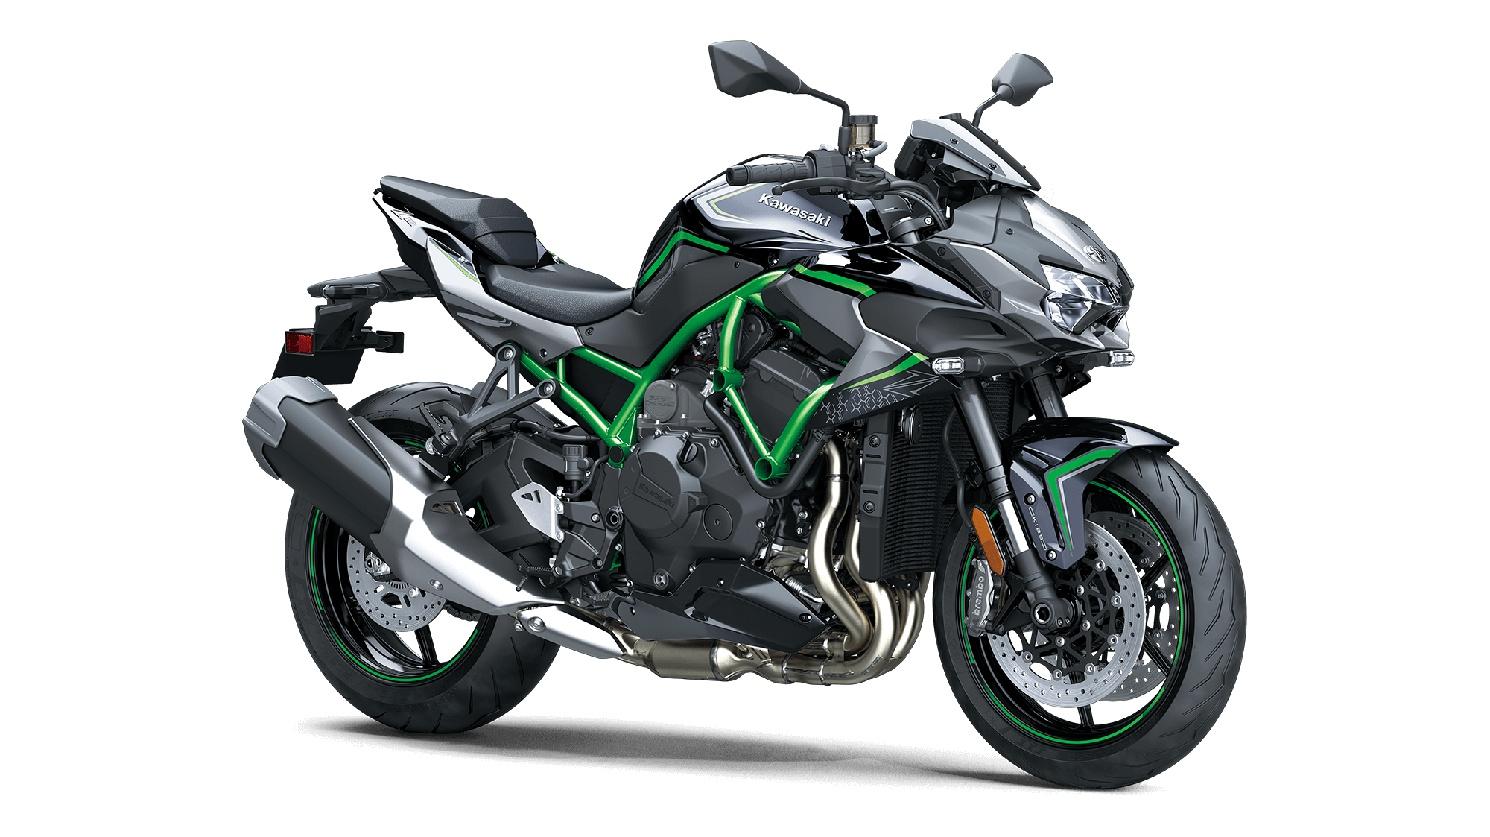 2020 Kawasaki Z H2 Metallic Spark Black/Metallic Graphite Gray/Mirror Coated Spark Black